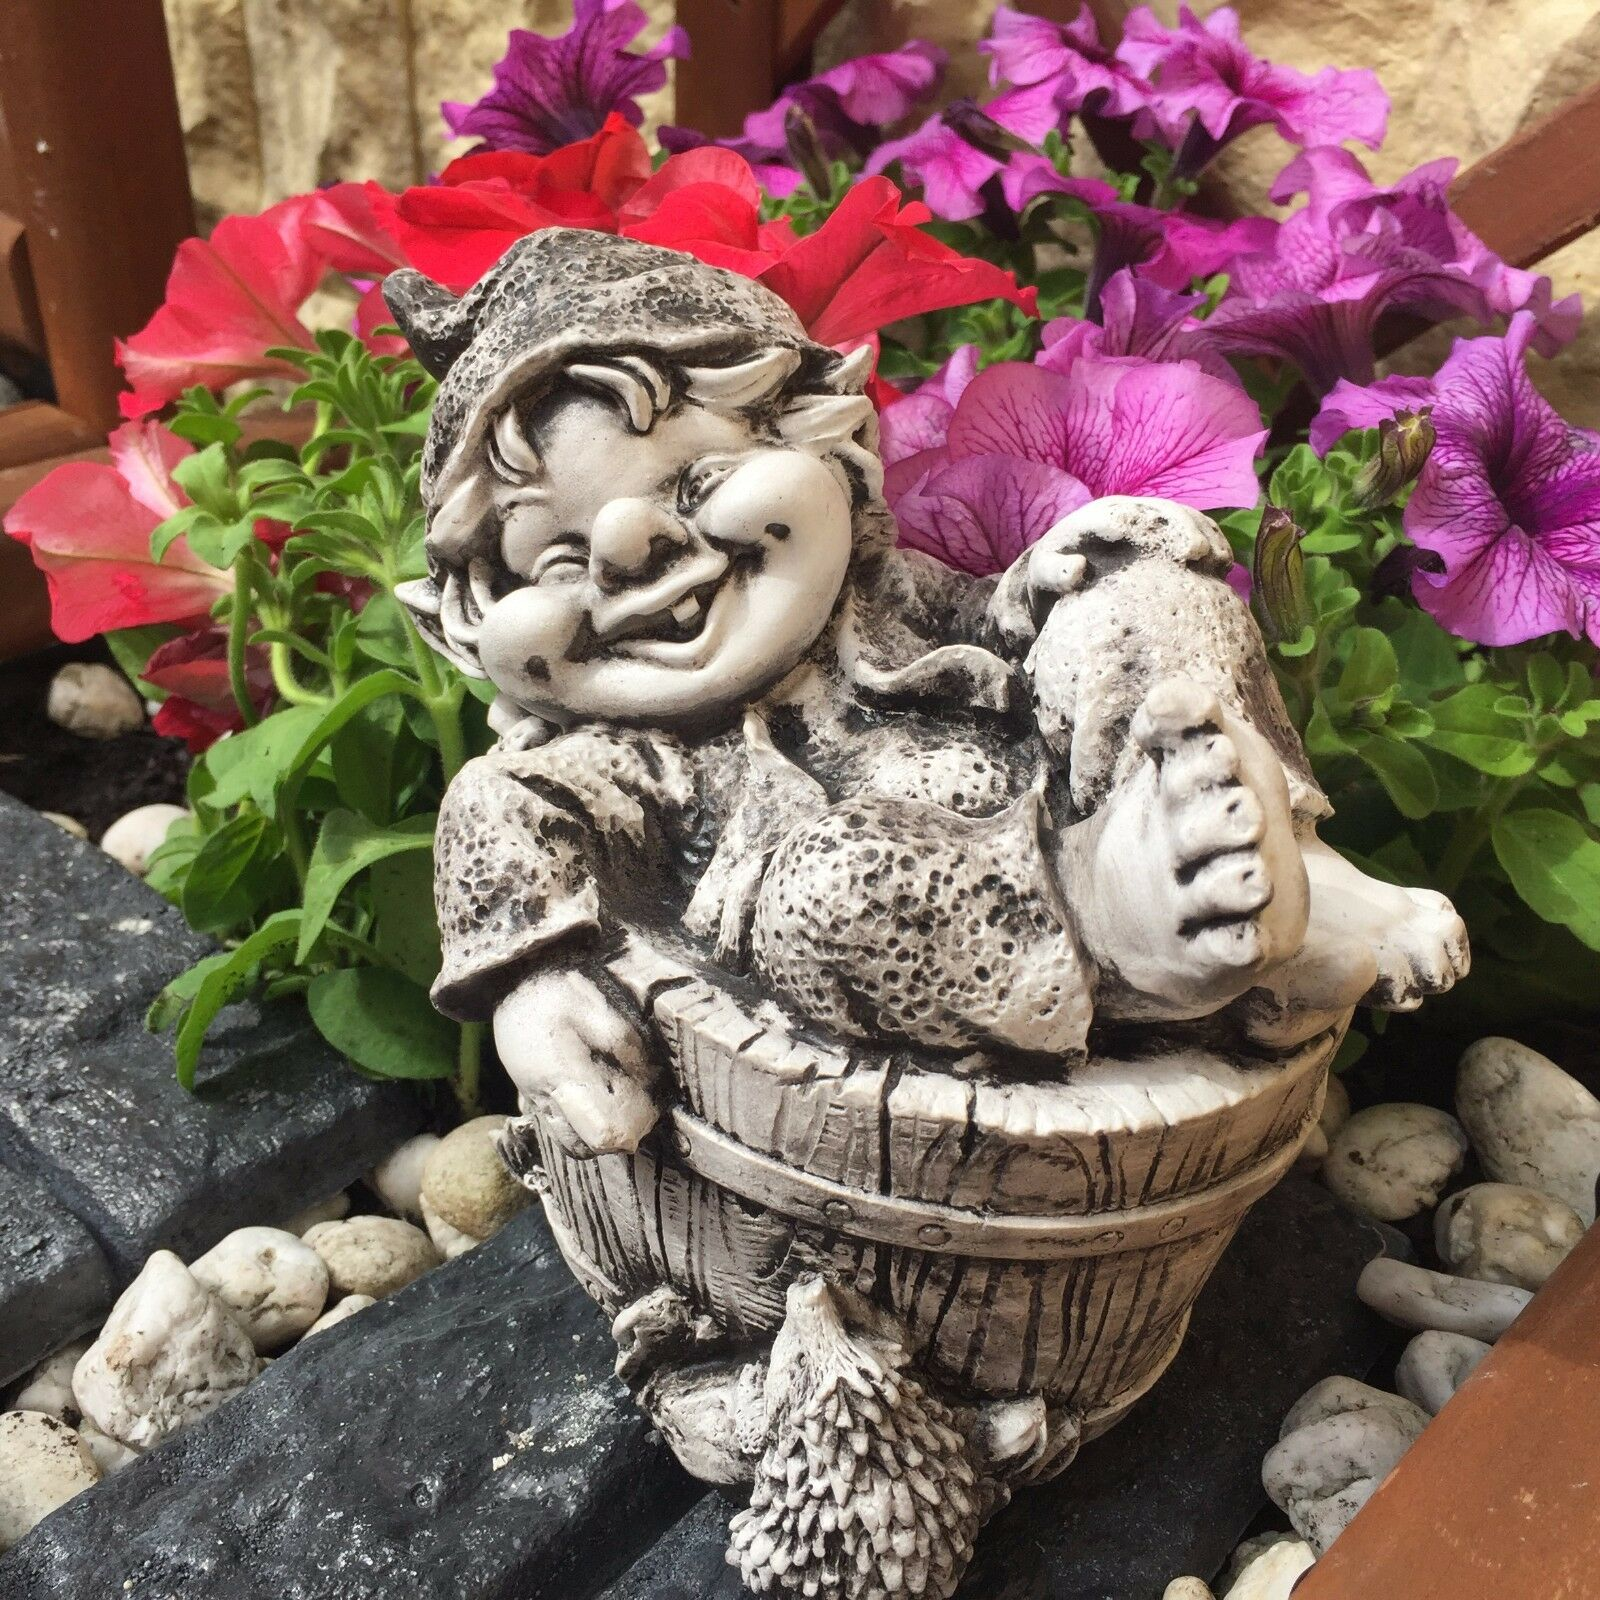 , Gnom, Troll, Kobold , Gartenfigur, Steinfigur ART R 1527